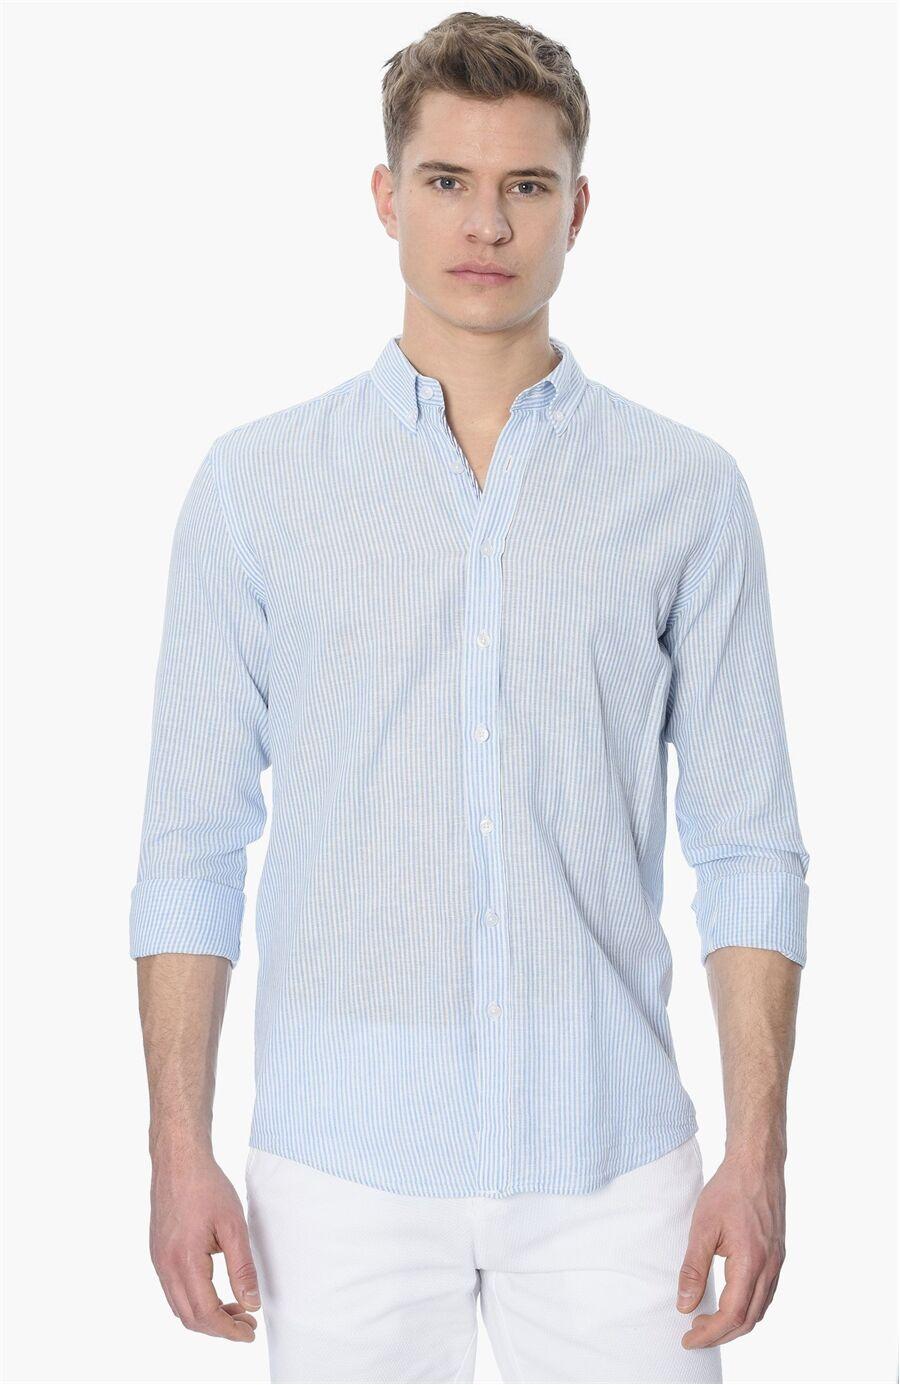 Çizgili Slım Fit Mavi Gömlek